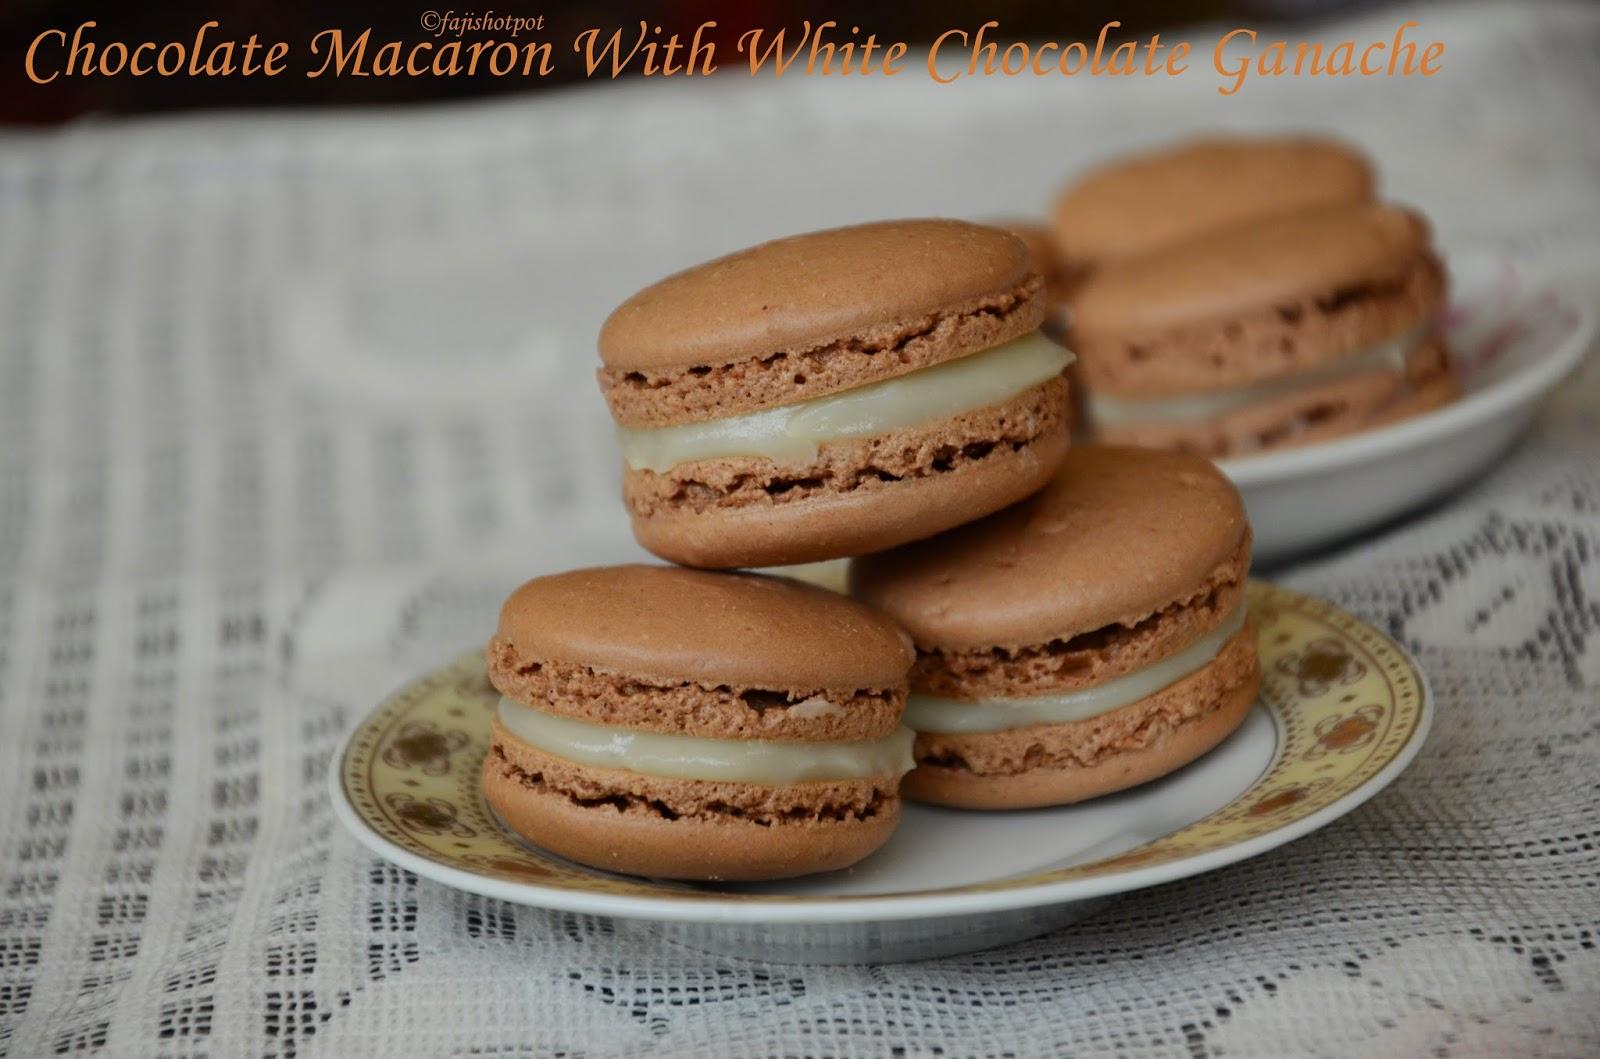 Faji's Hot Pot: Chocolate Macaron With White Chocolate Ganache